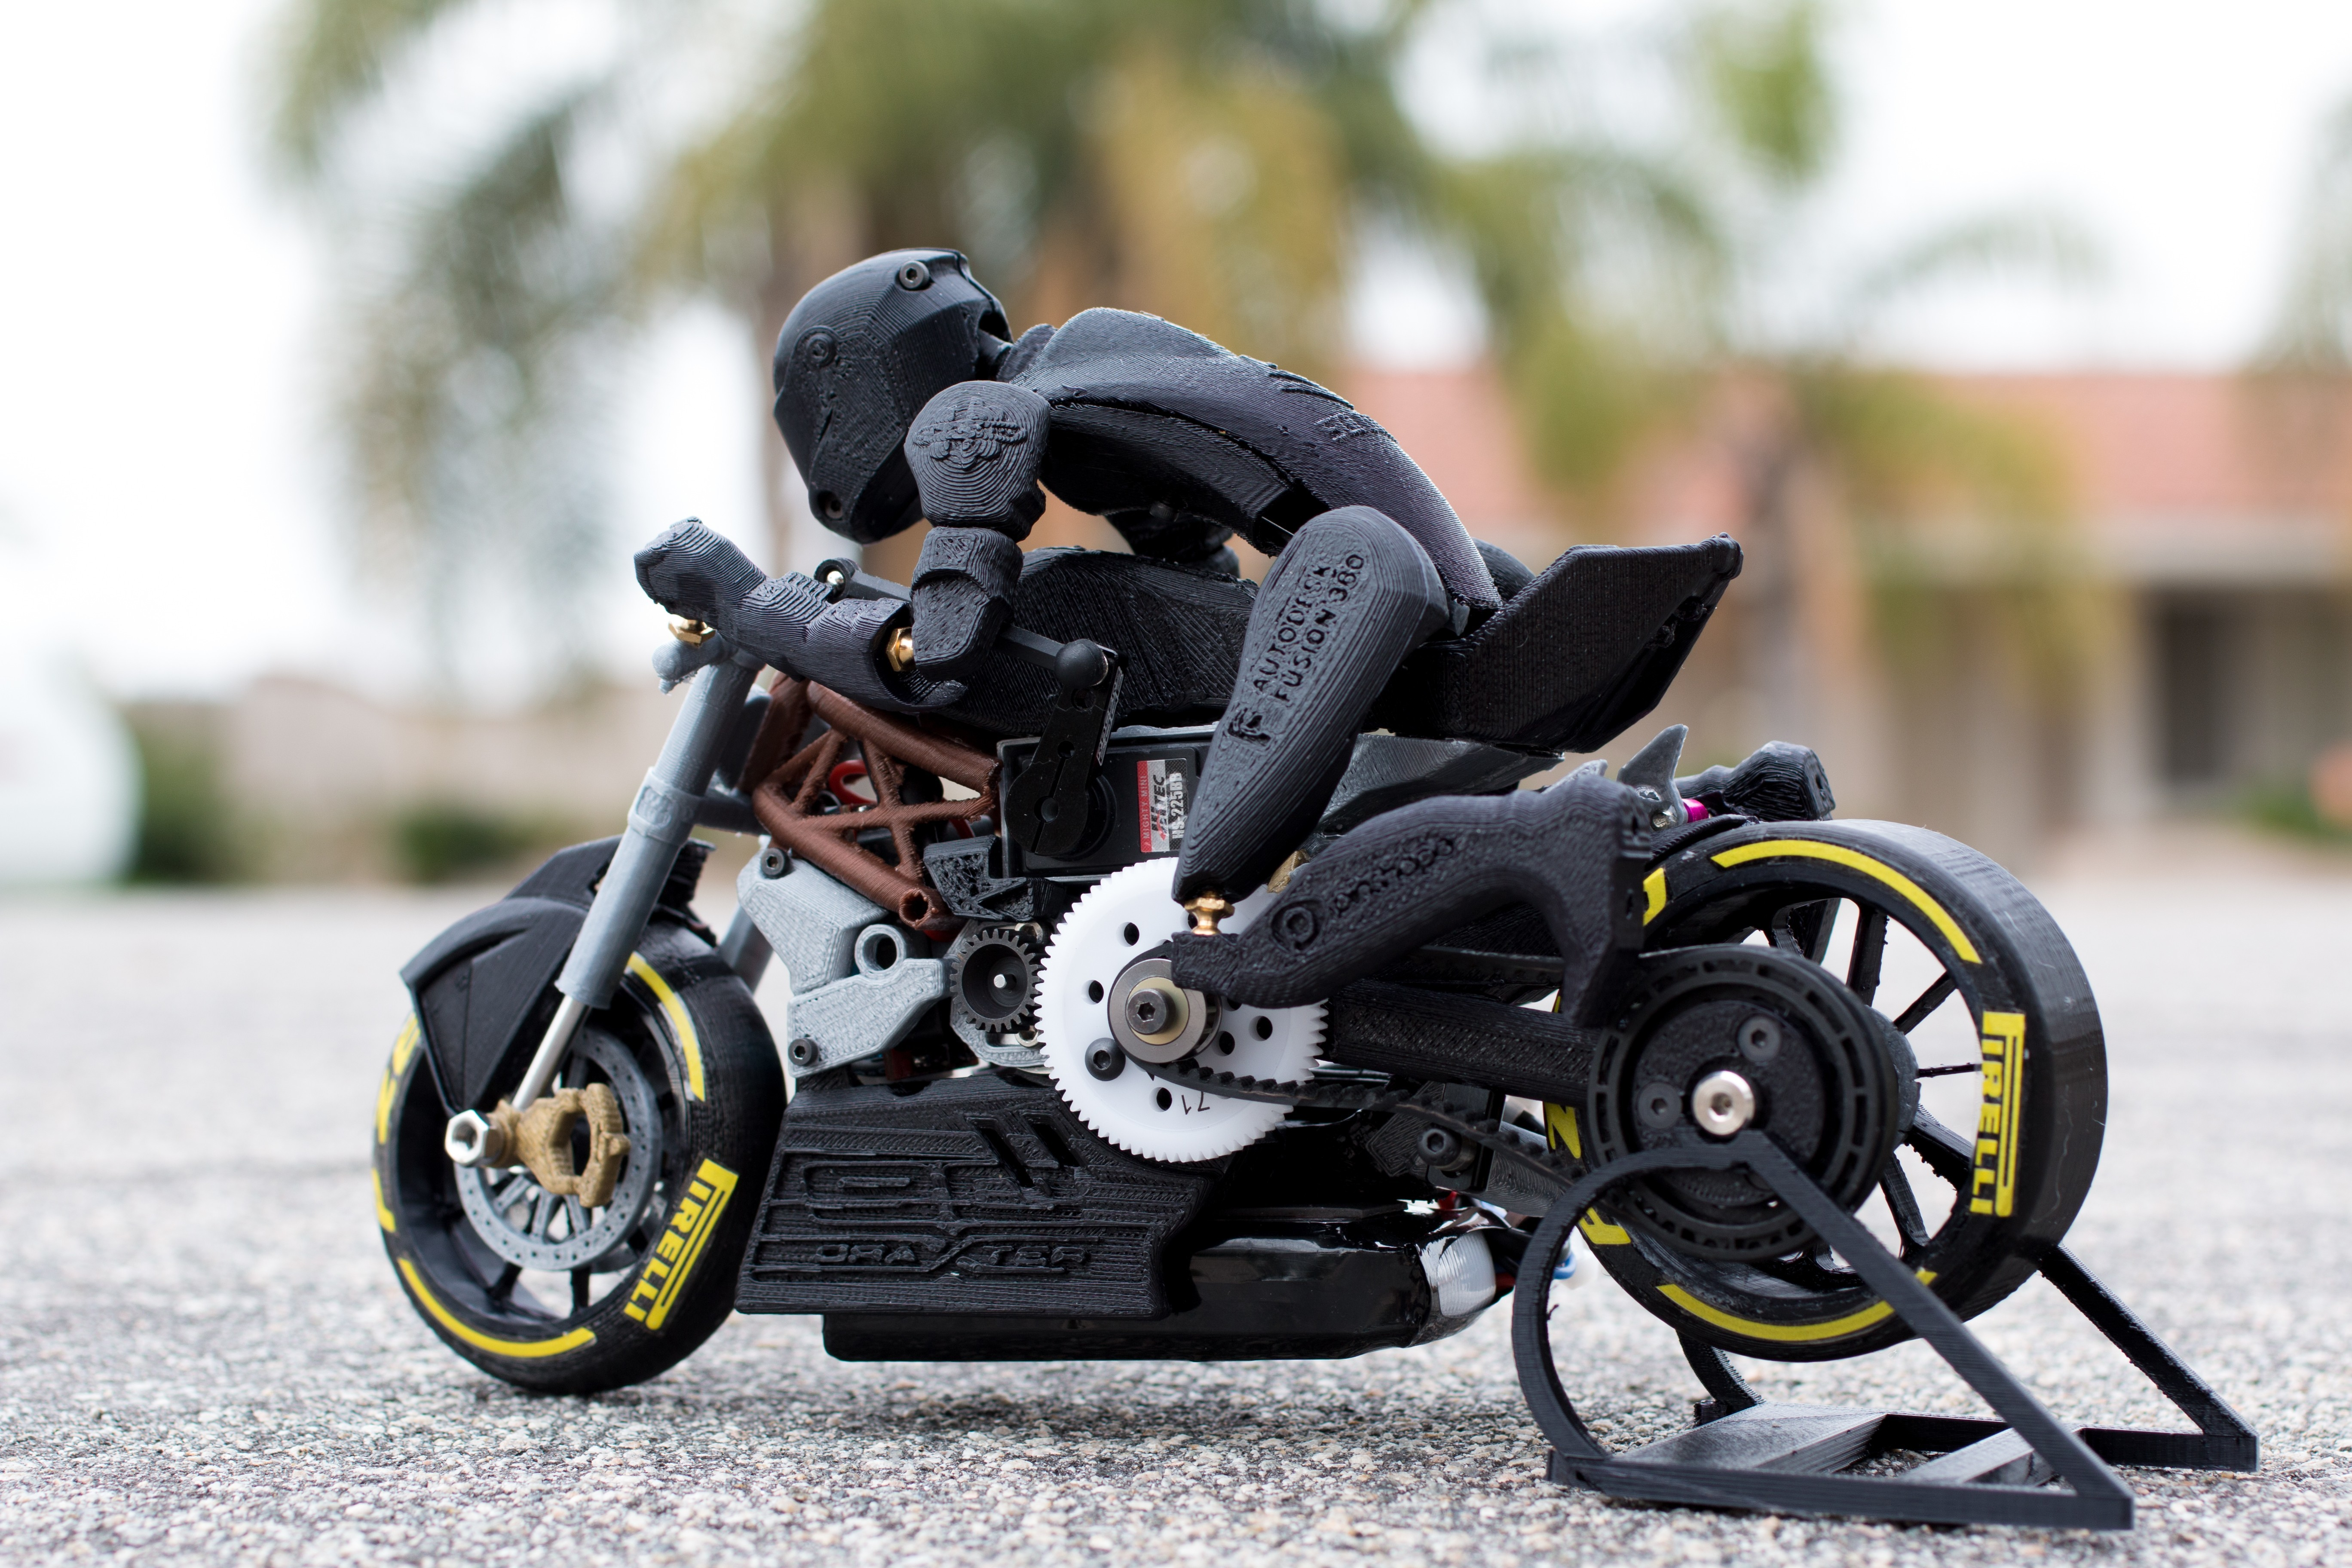 _MG_4461.jpg Download free STL file 2016 Ducati Draxter Concept Drag Bike RC • 3D printer template, brett